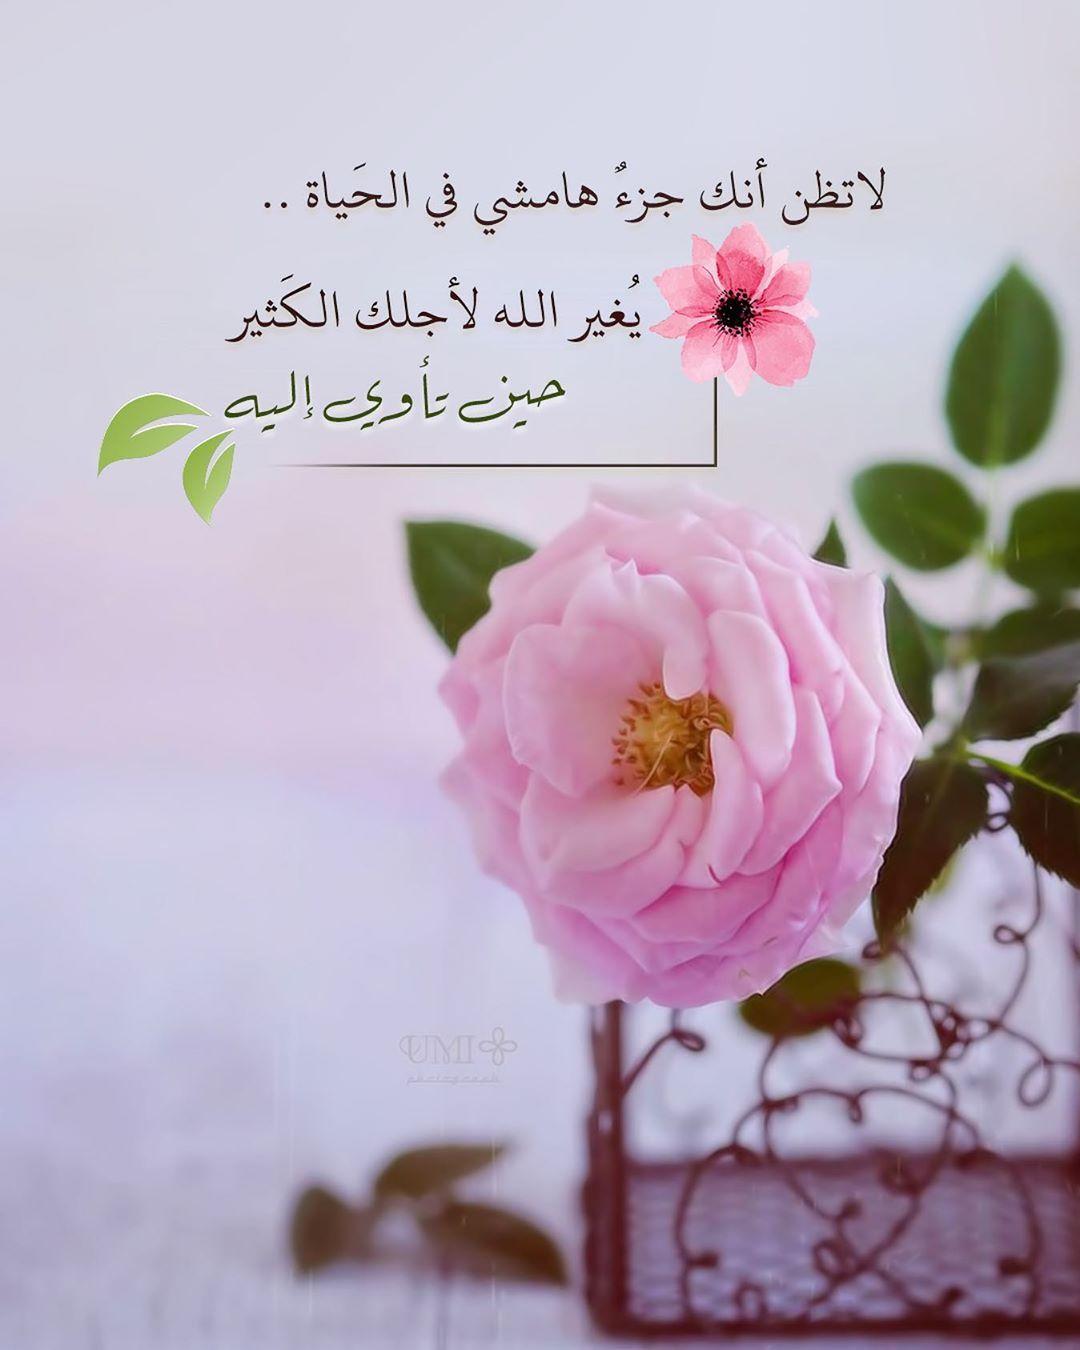 P E A R L A On Instagram لات ظن أن ك جزء ه امشي في الح ياة ي غير الله لأ Mom And Dad Quotes Islamic Phrases Decoupage Paper Printable